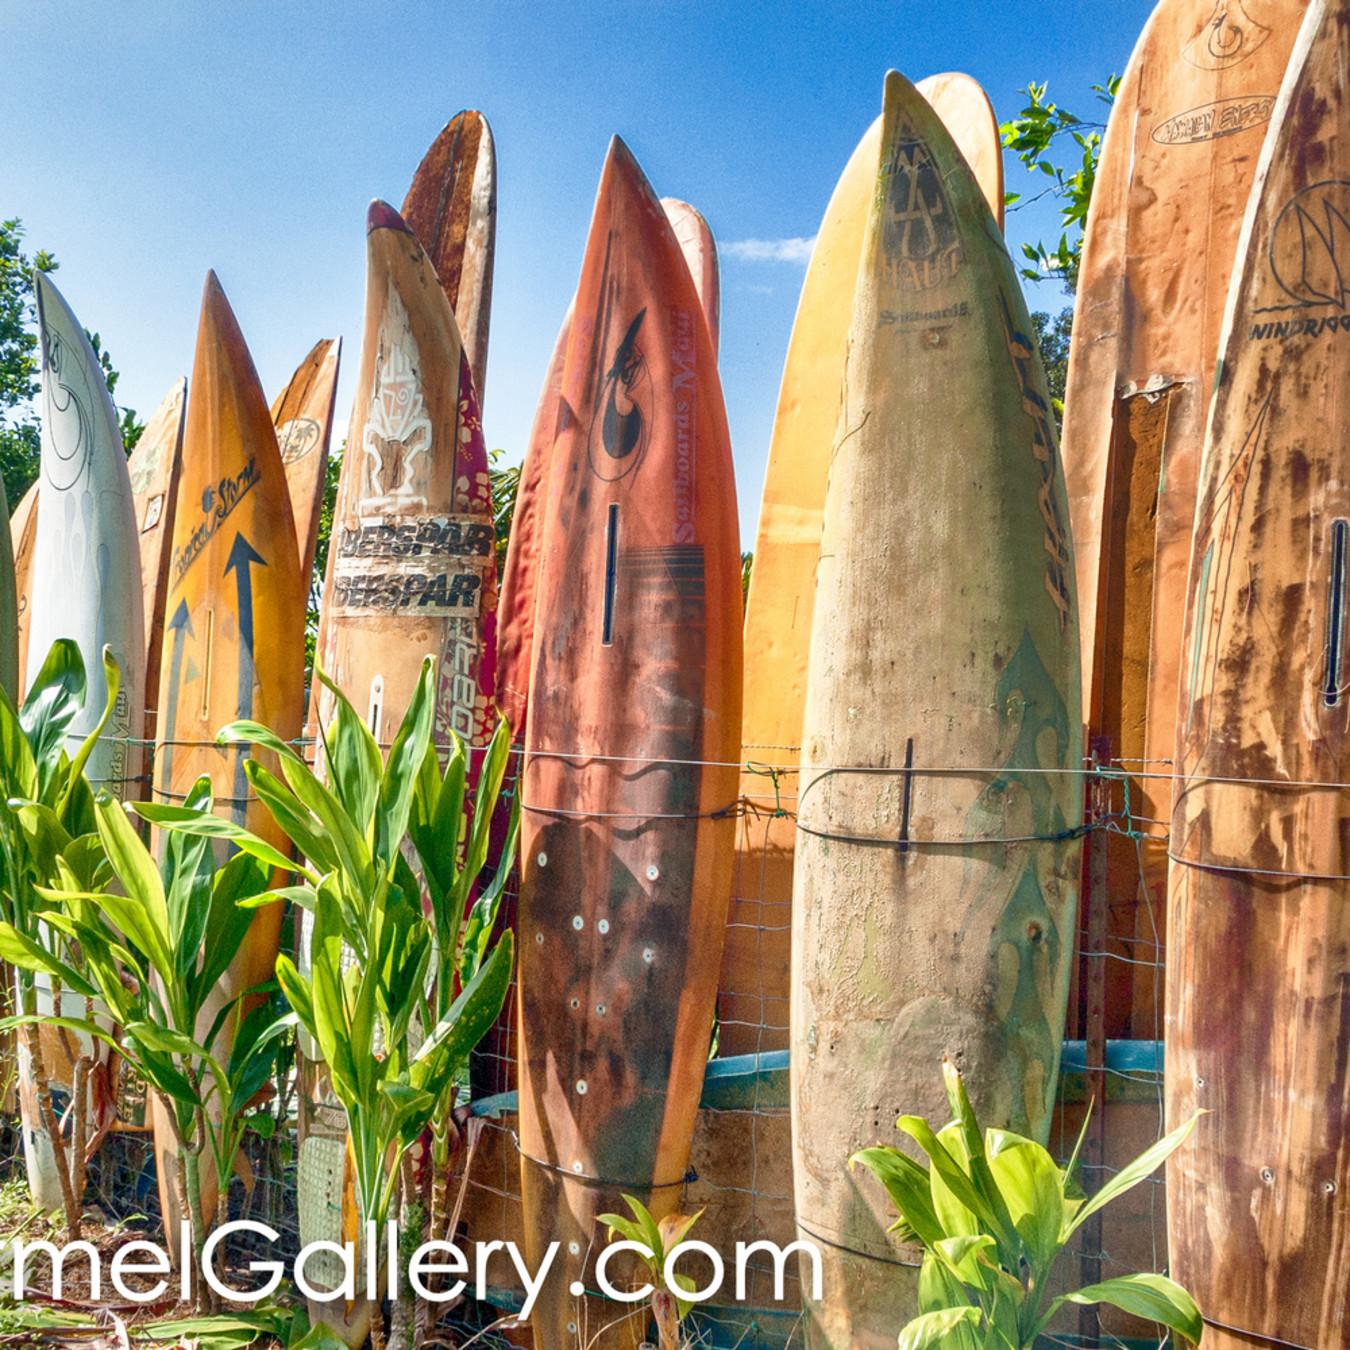 Surfboard shimmer slj99i